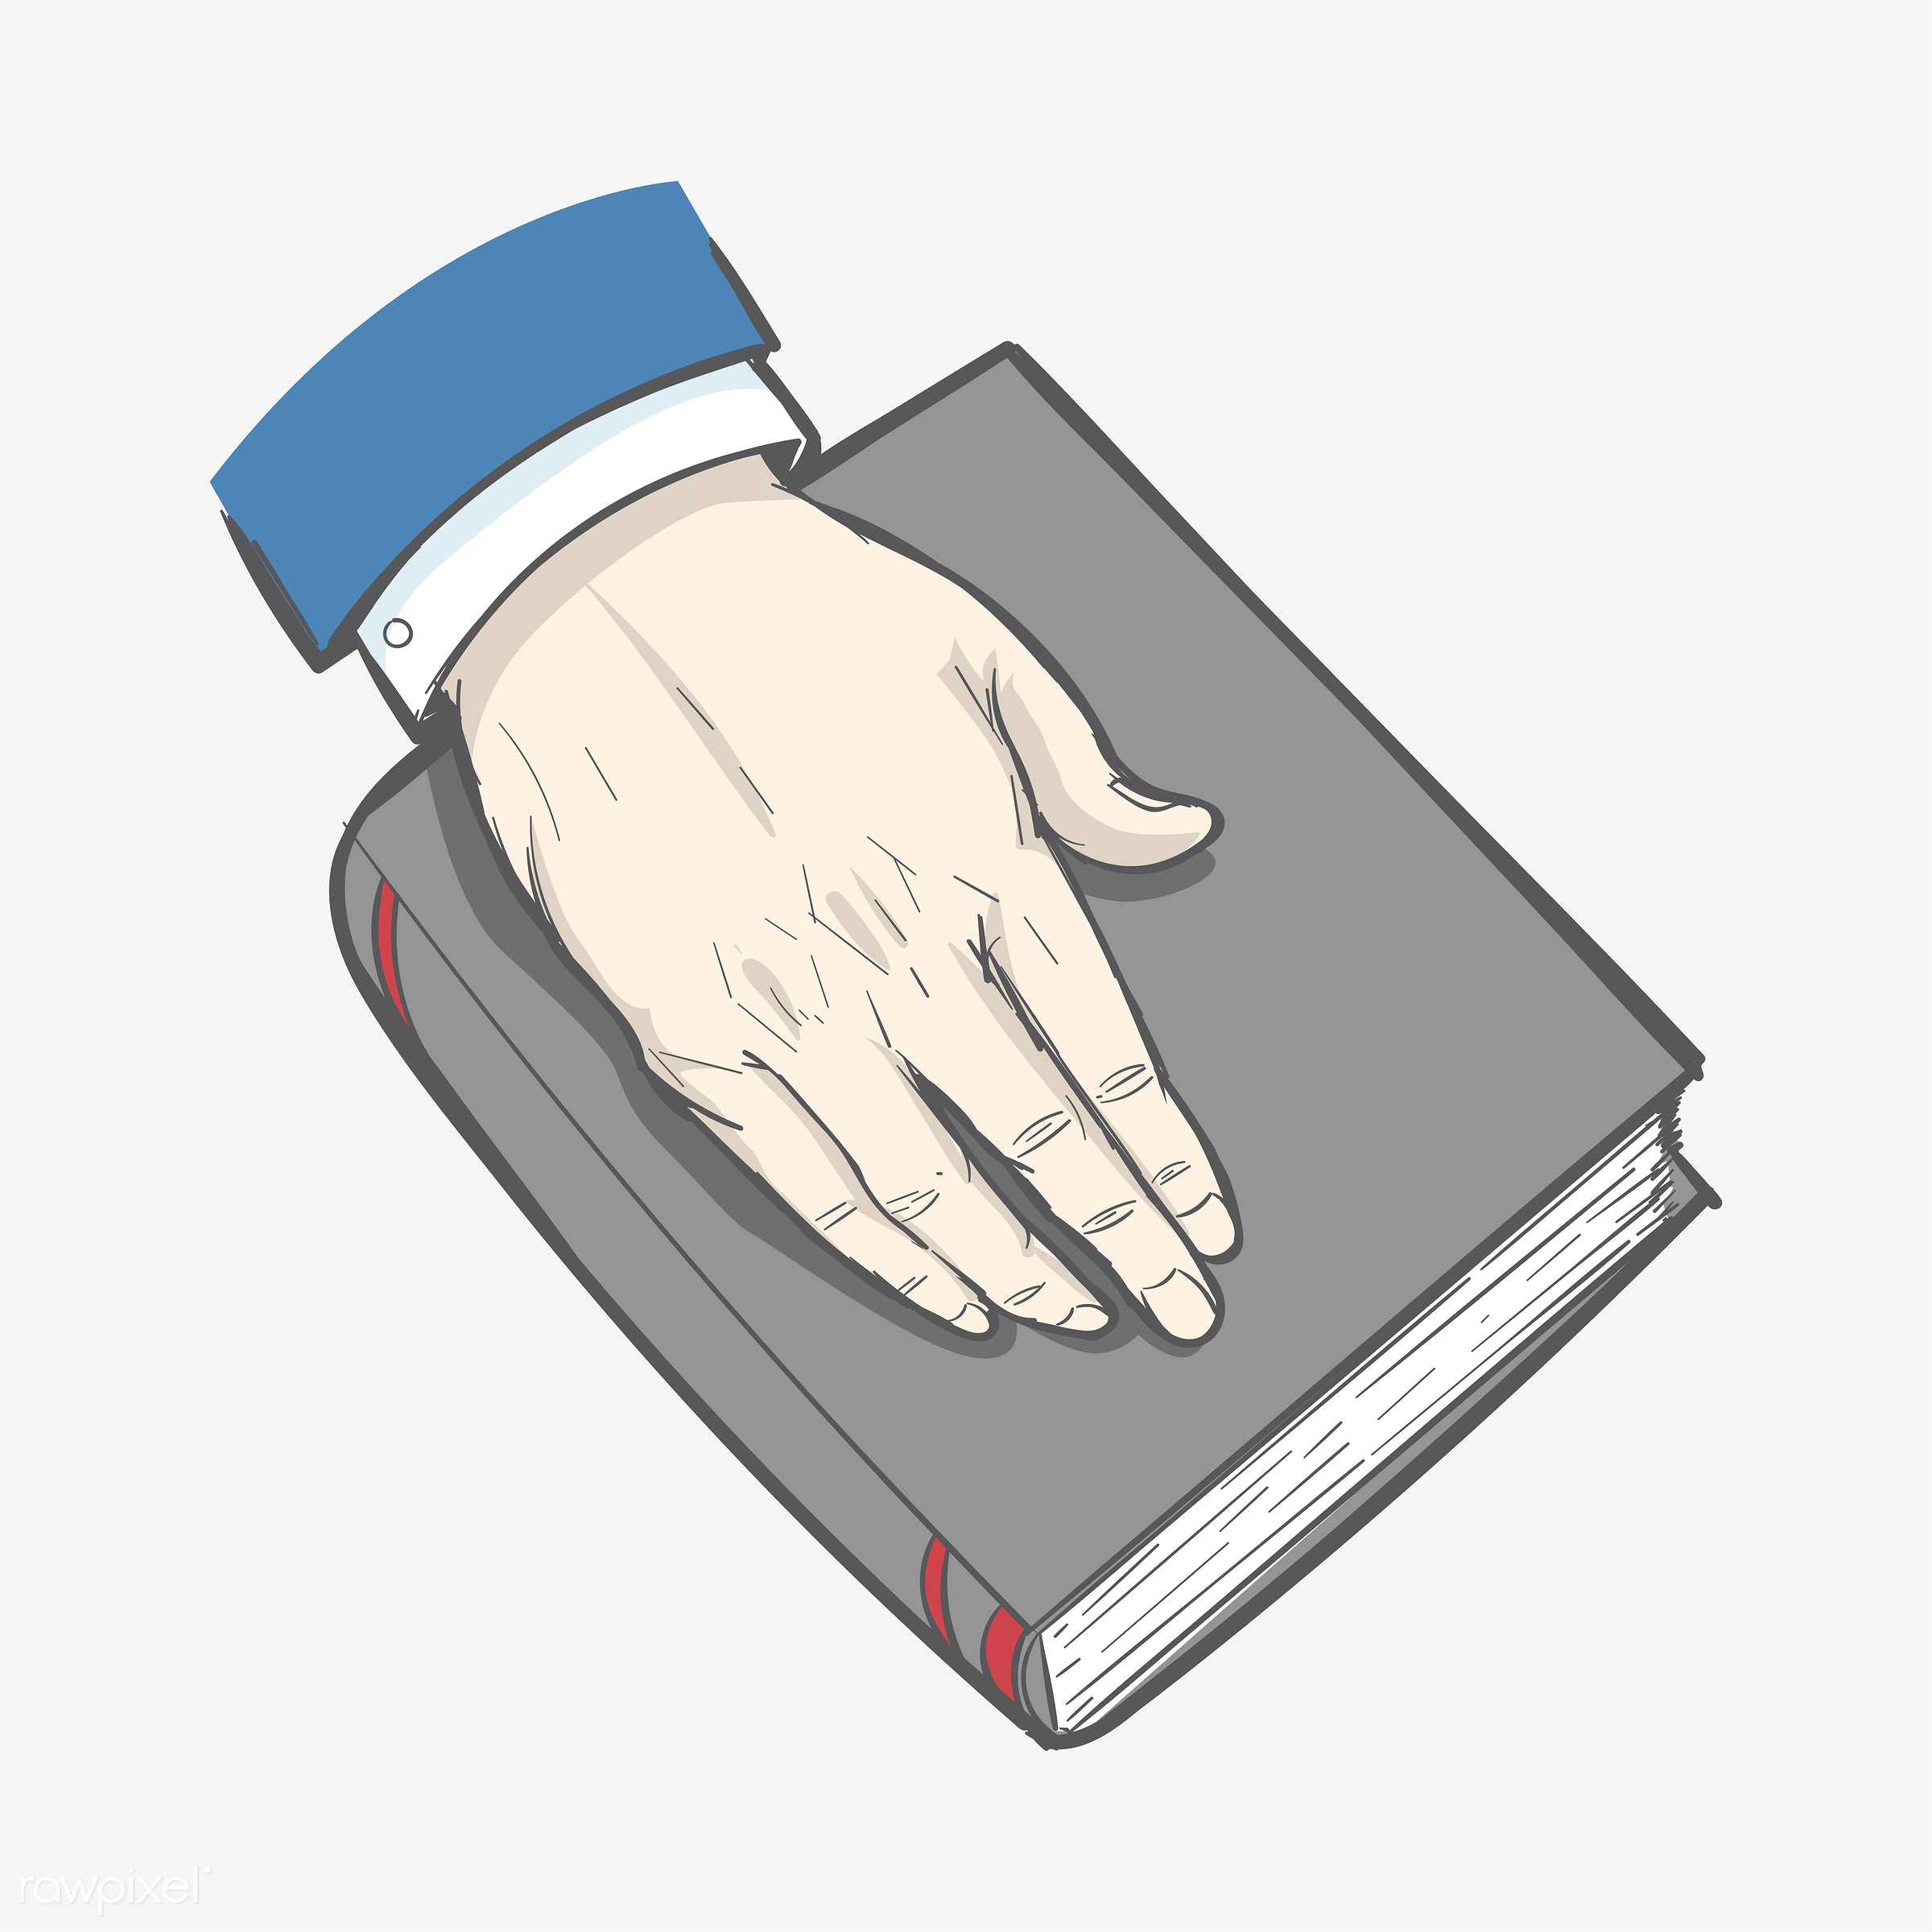 Hand drawn illustration of justice - art, artwork, bible, court, creative, creativity, design, draw, drawing, drawn,...